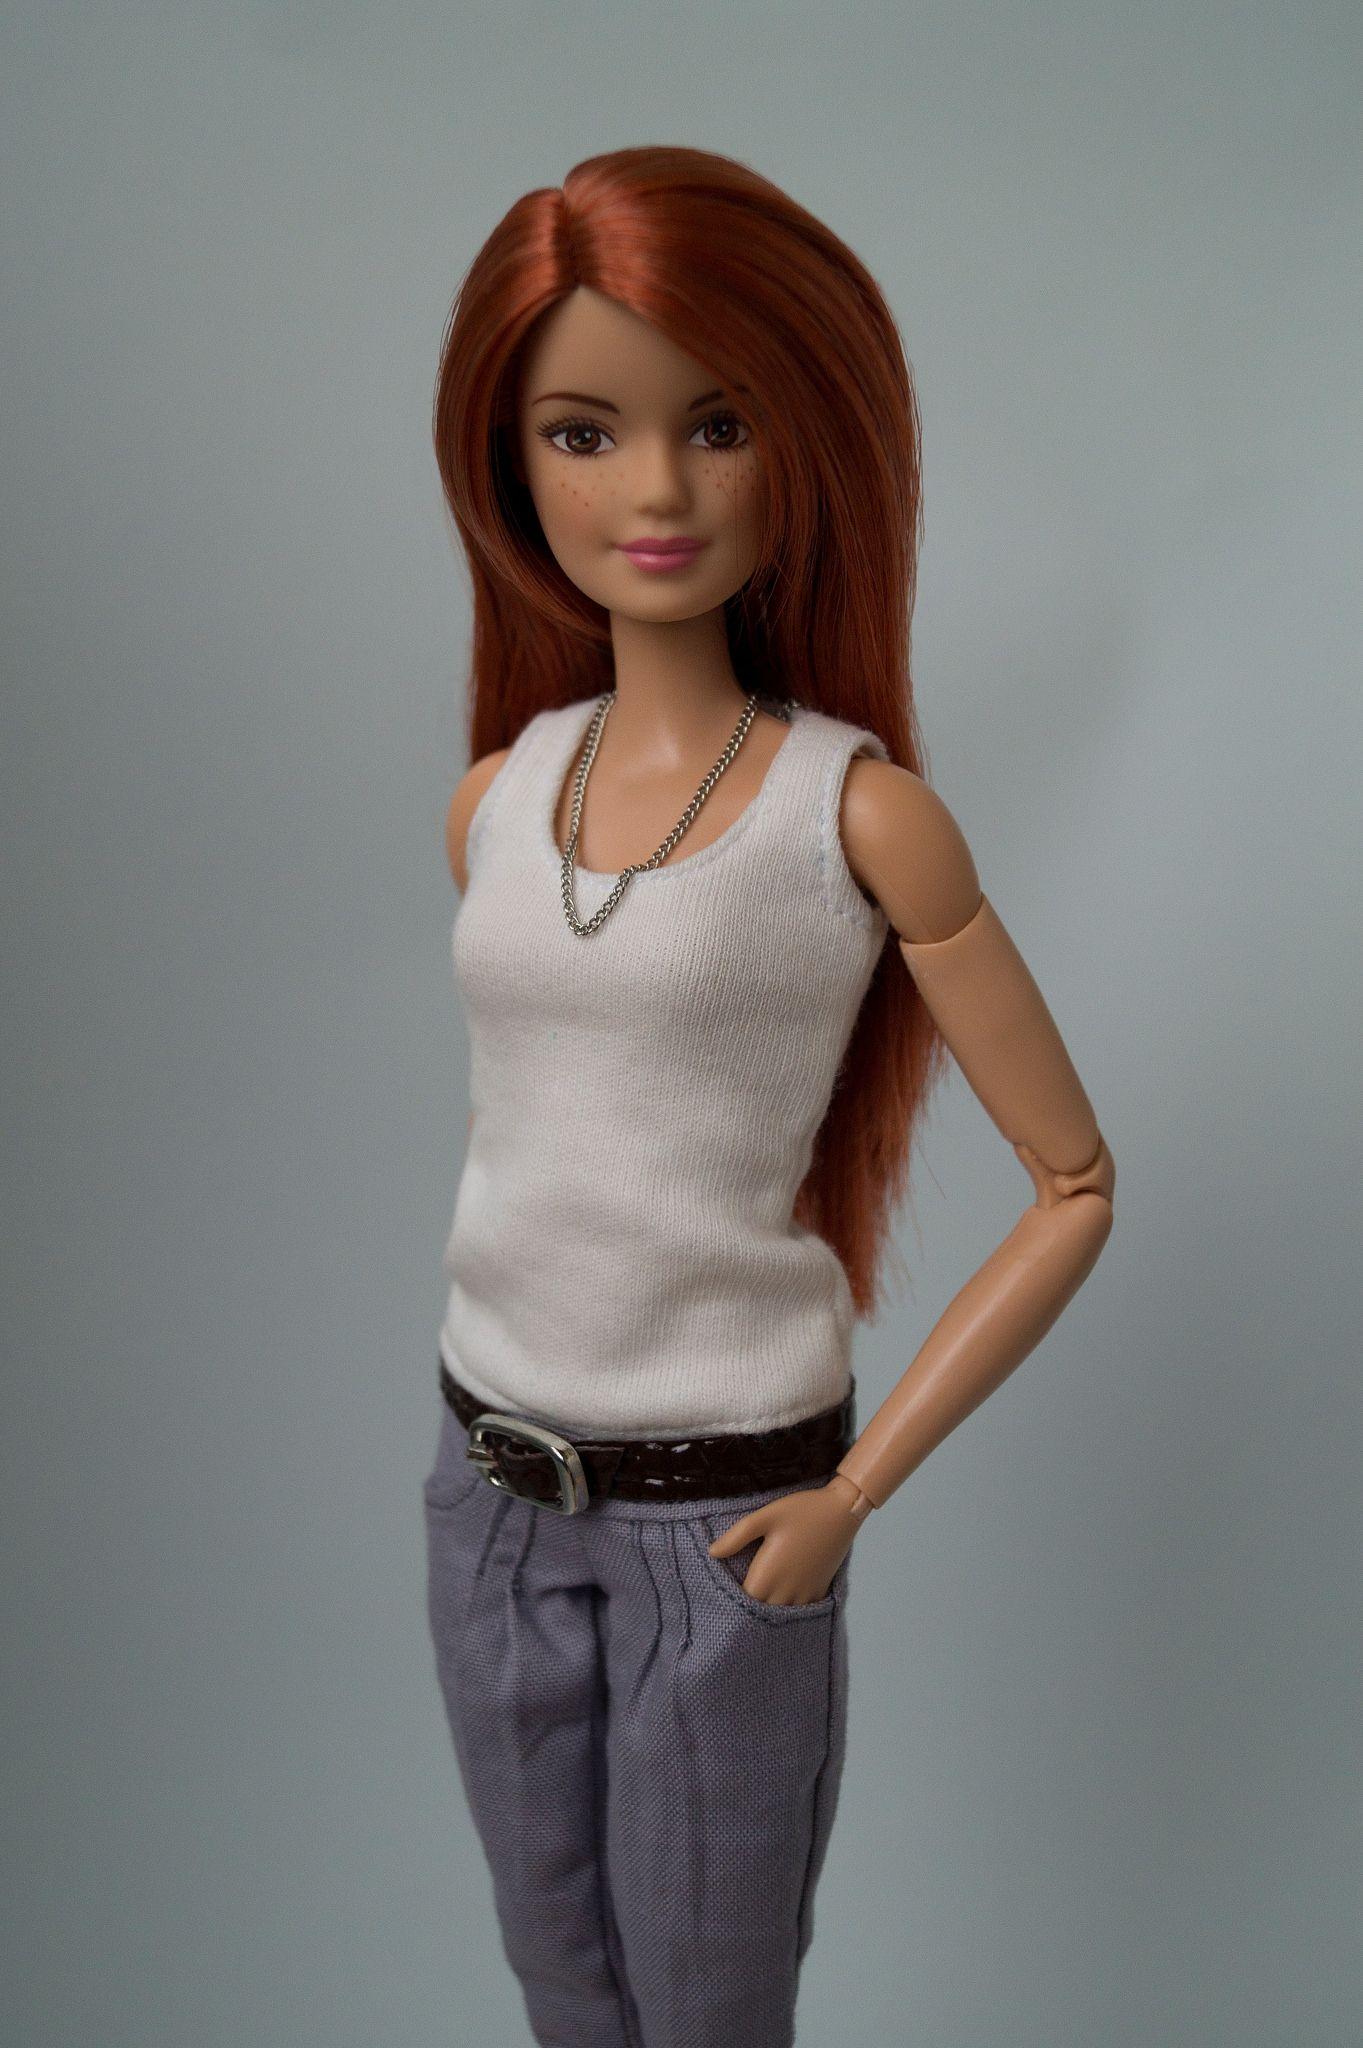 Redhead work clothing